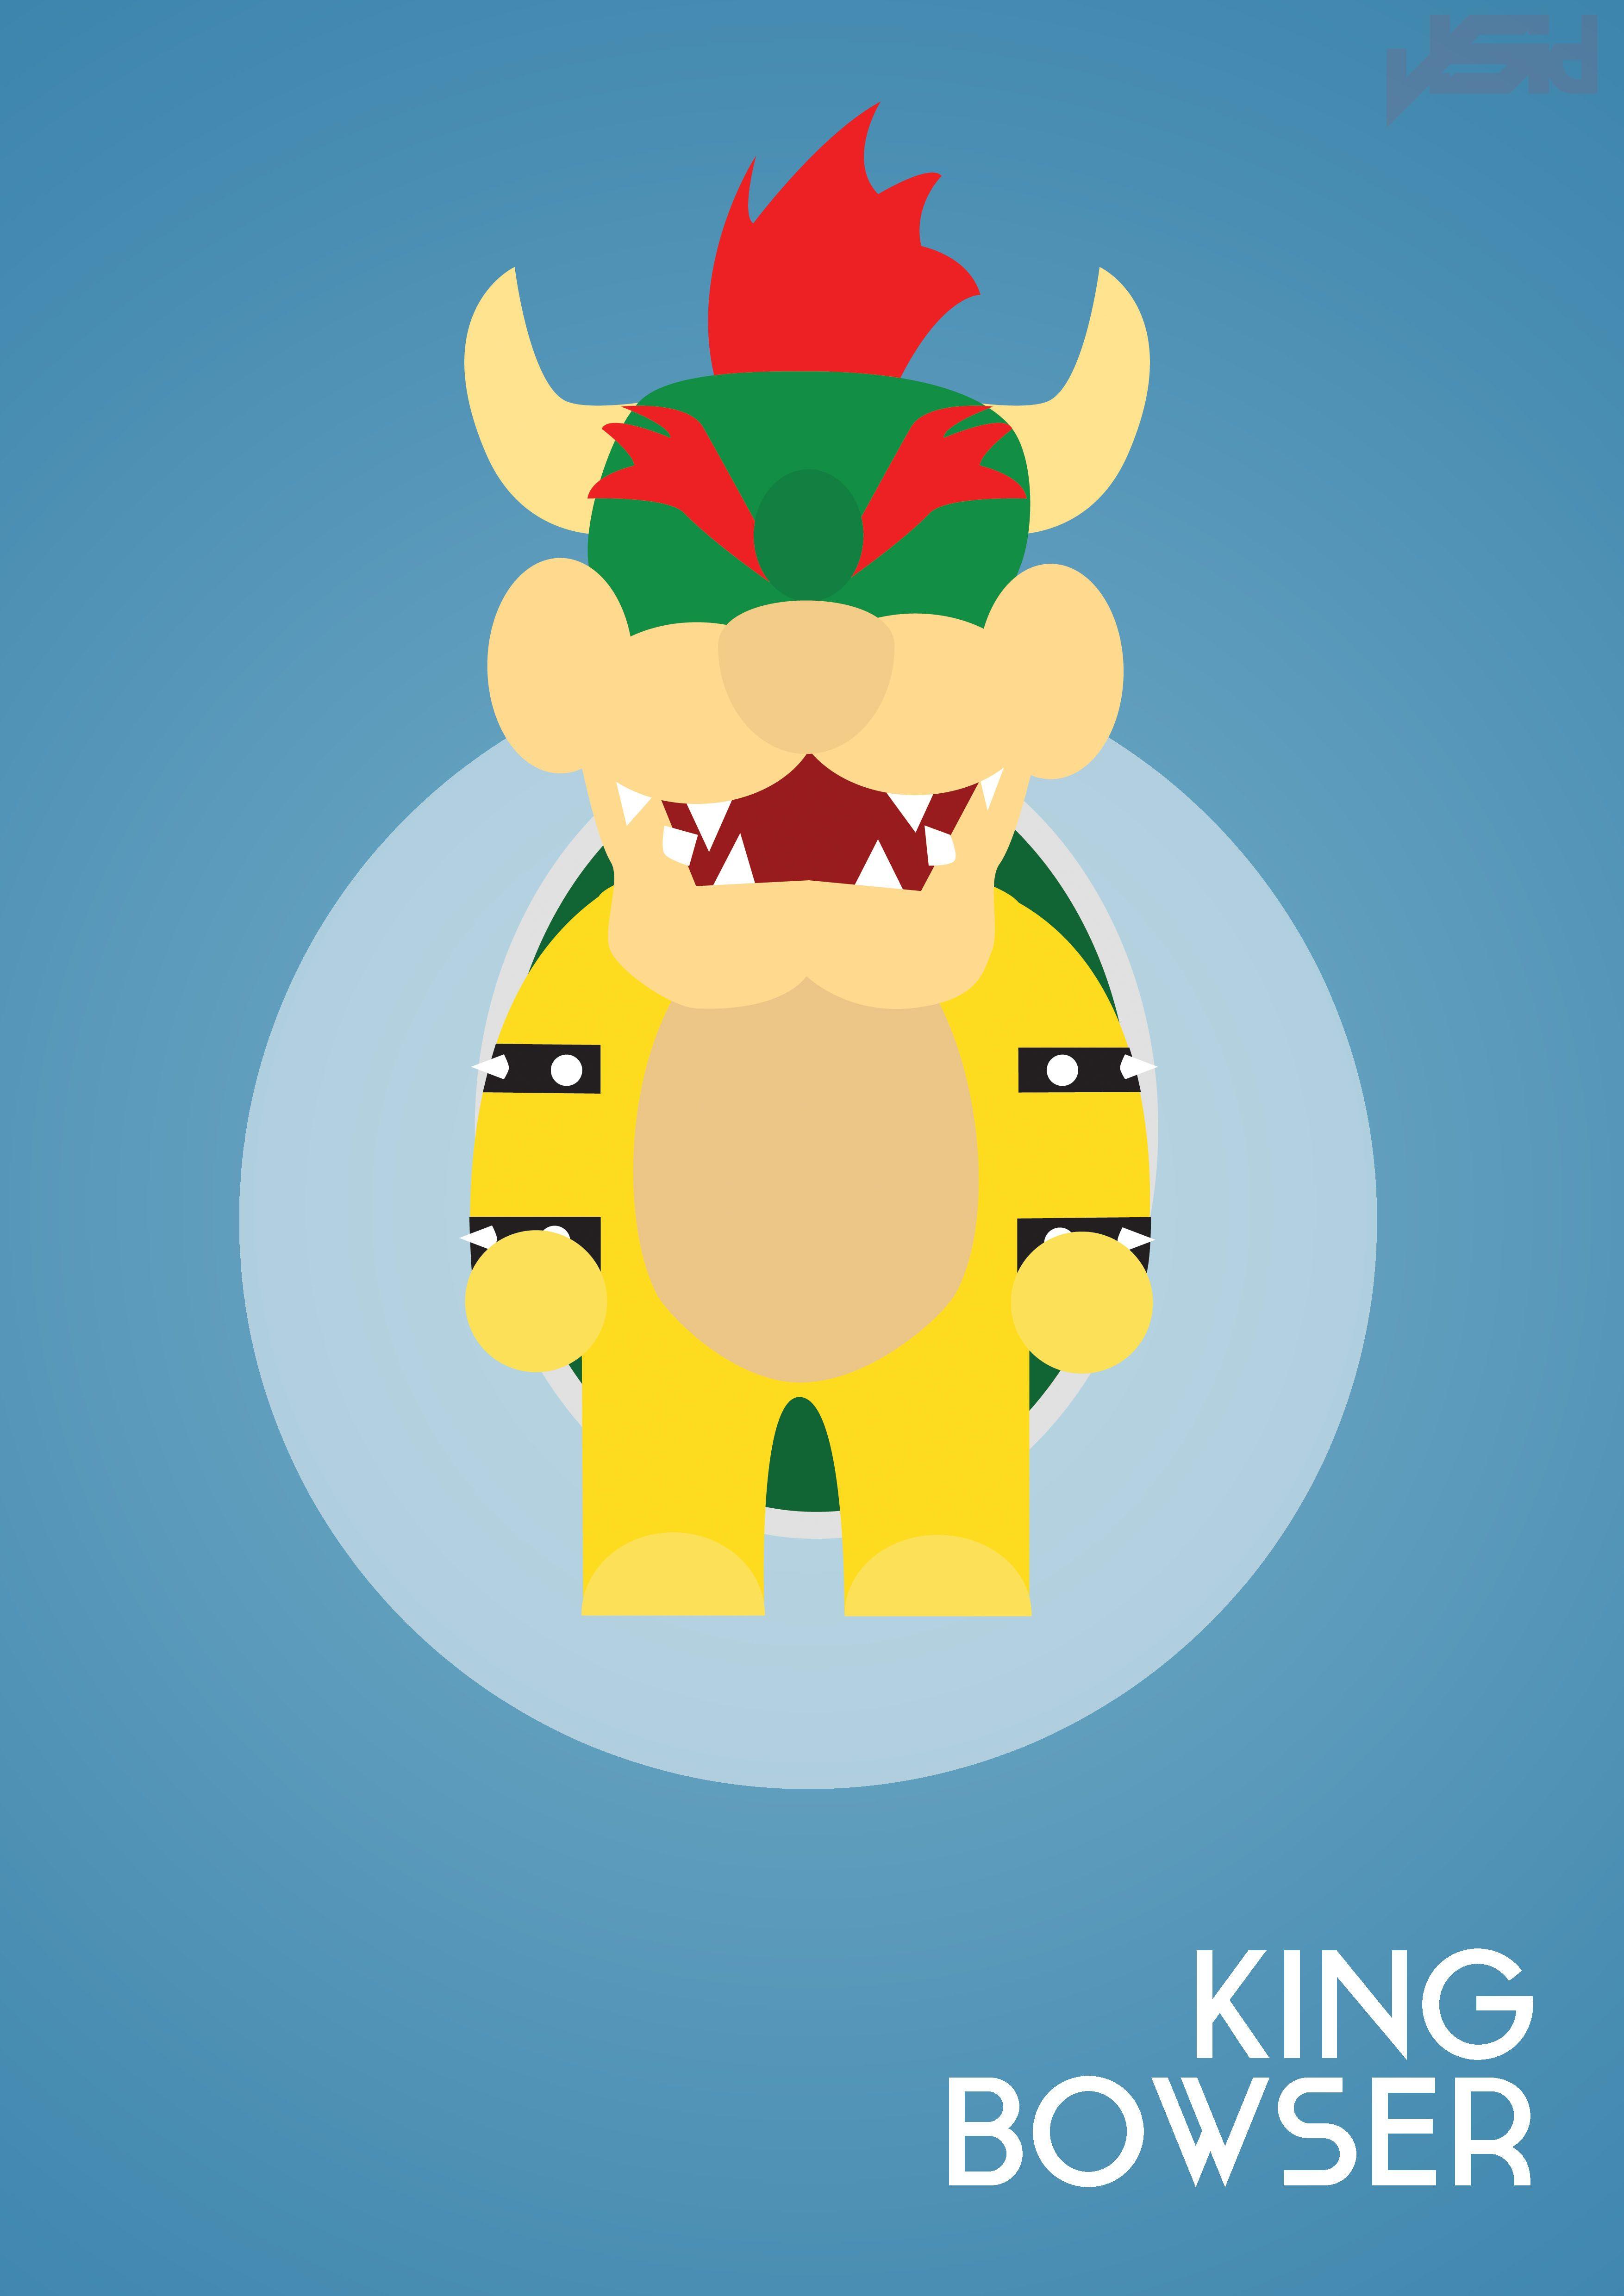 King bowser super mario bros super mario brothers